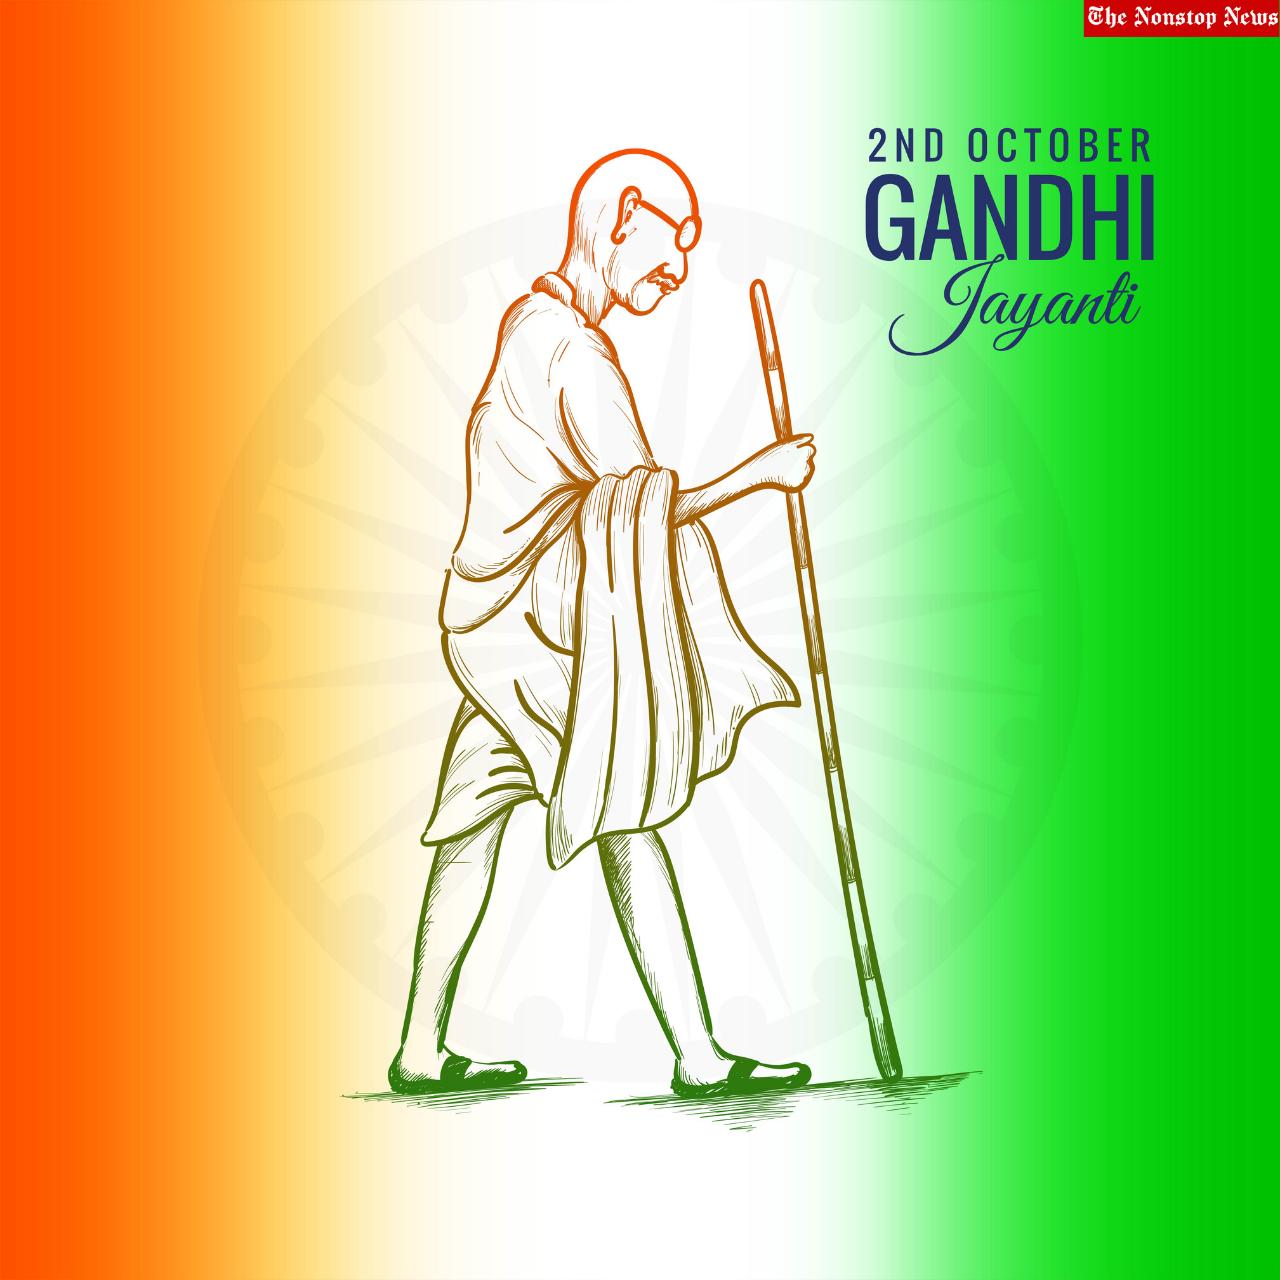 Mahatma Gandhi Jayanti 2021 Instagram Captions, Status, Wallpaper, Social Media Posts, Poster, Banner, and Drawing to Share